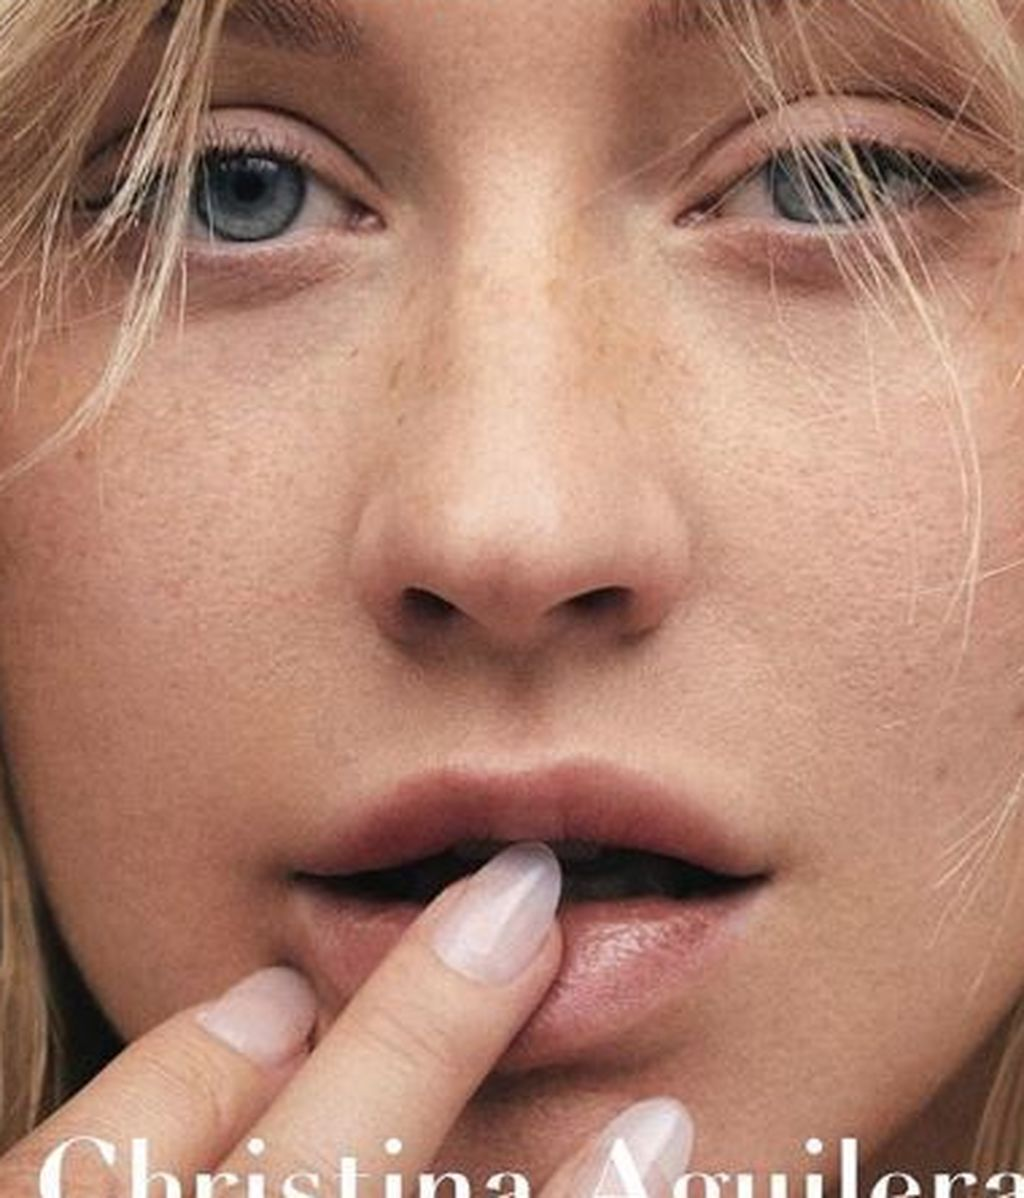 Christina Aguilera reaparece transformada y sin maquillaje